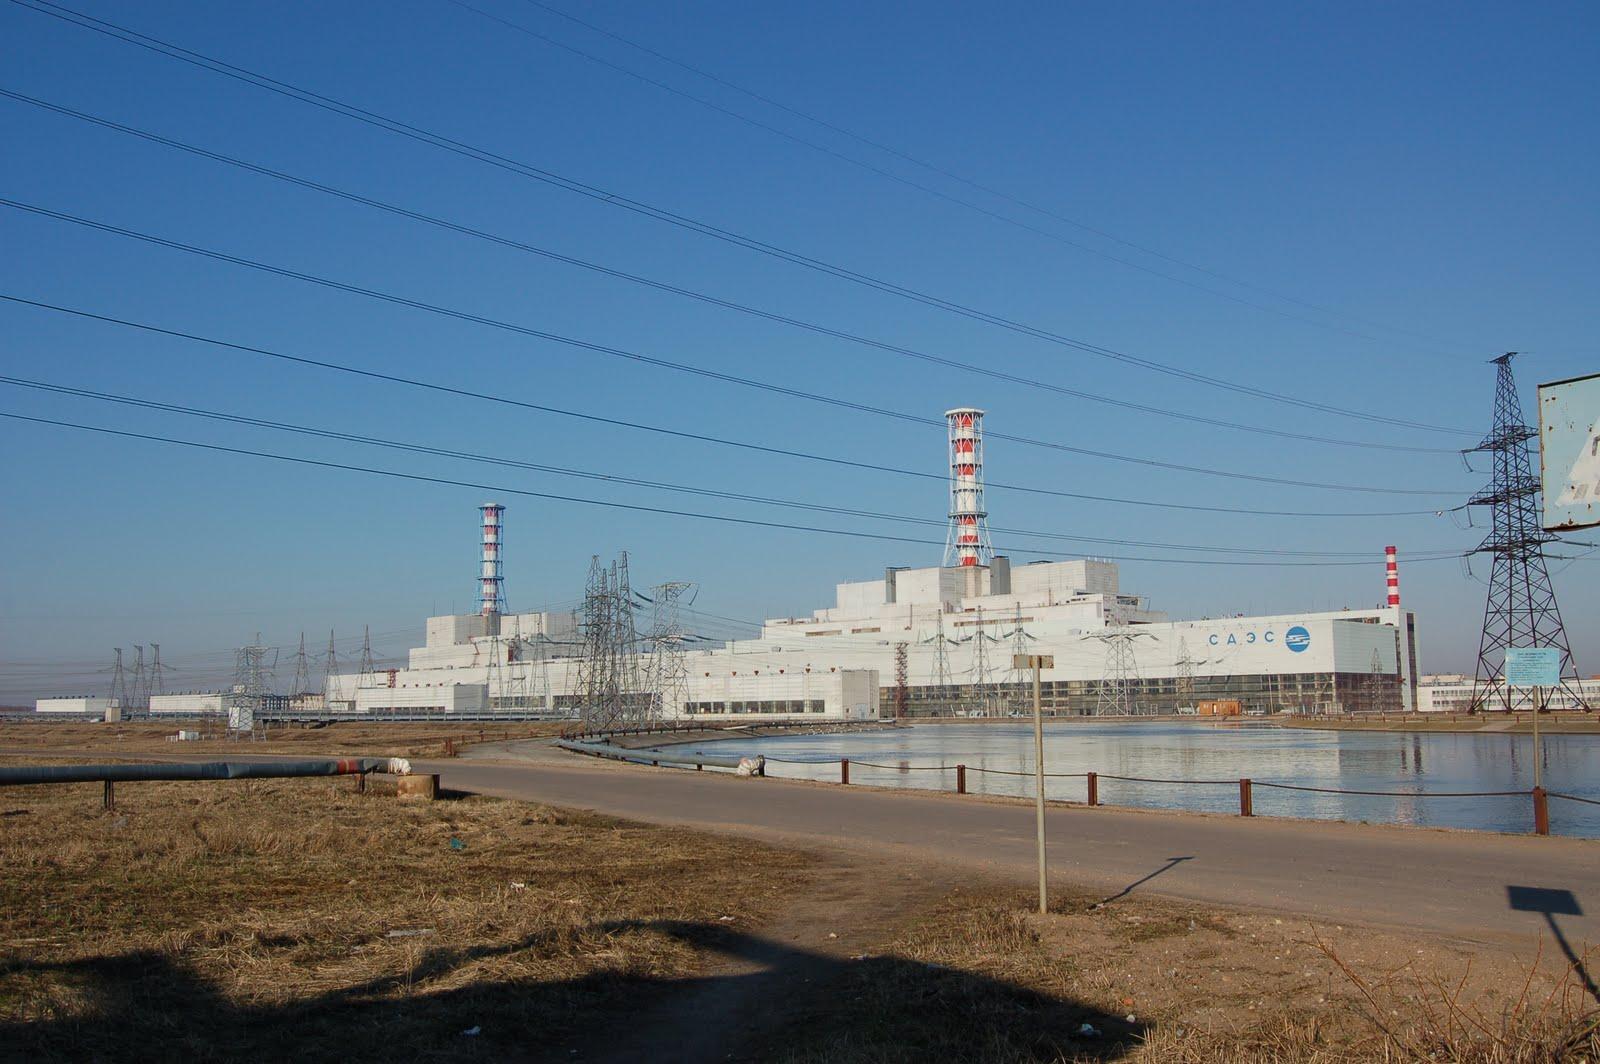 http://1.bp.blogspot.com/-h3wmgbnppuw/TjK6HKvBO6I/AAAAAAAAA4I/gPHomR3nLOg/s1600/Smolensk_Nuclear_Power_Plant.jpg